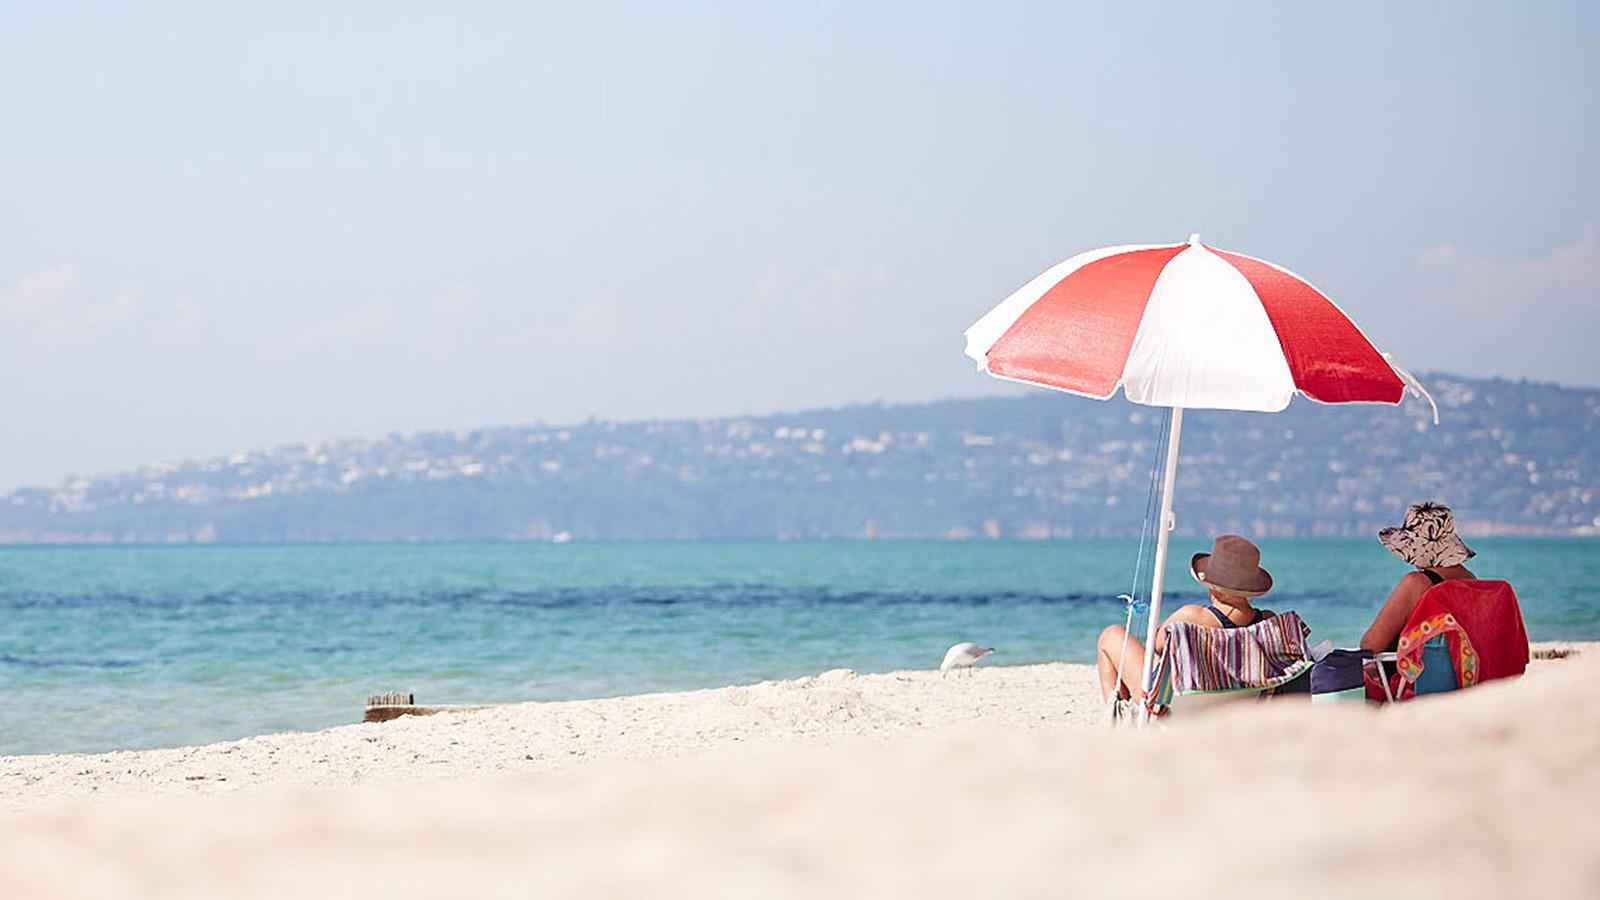 McRae Beach, Mornington Peninsula, Victoria, Australia